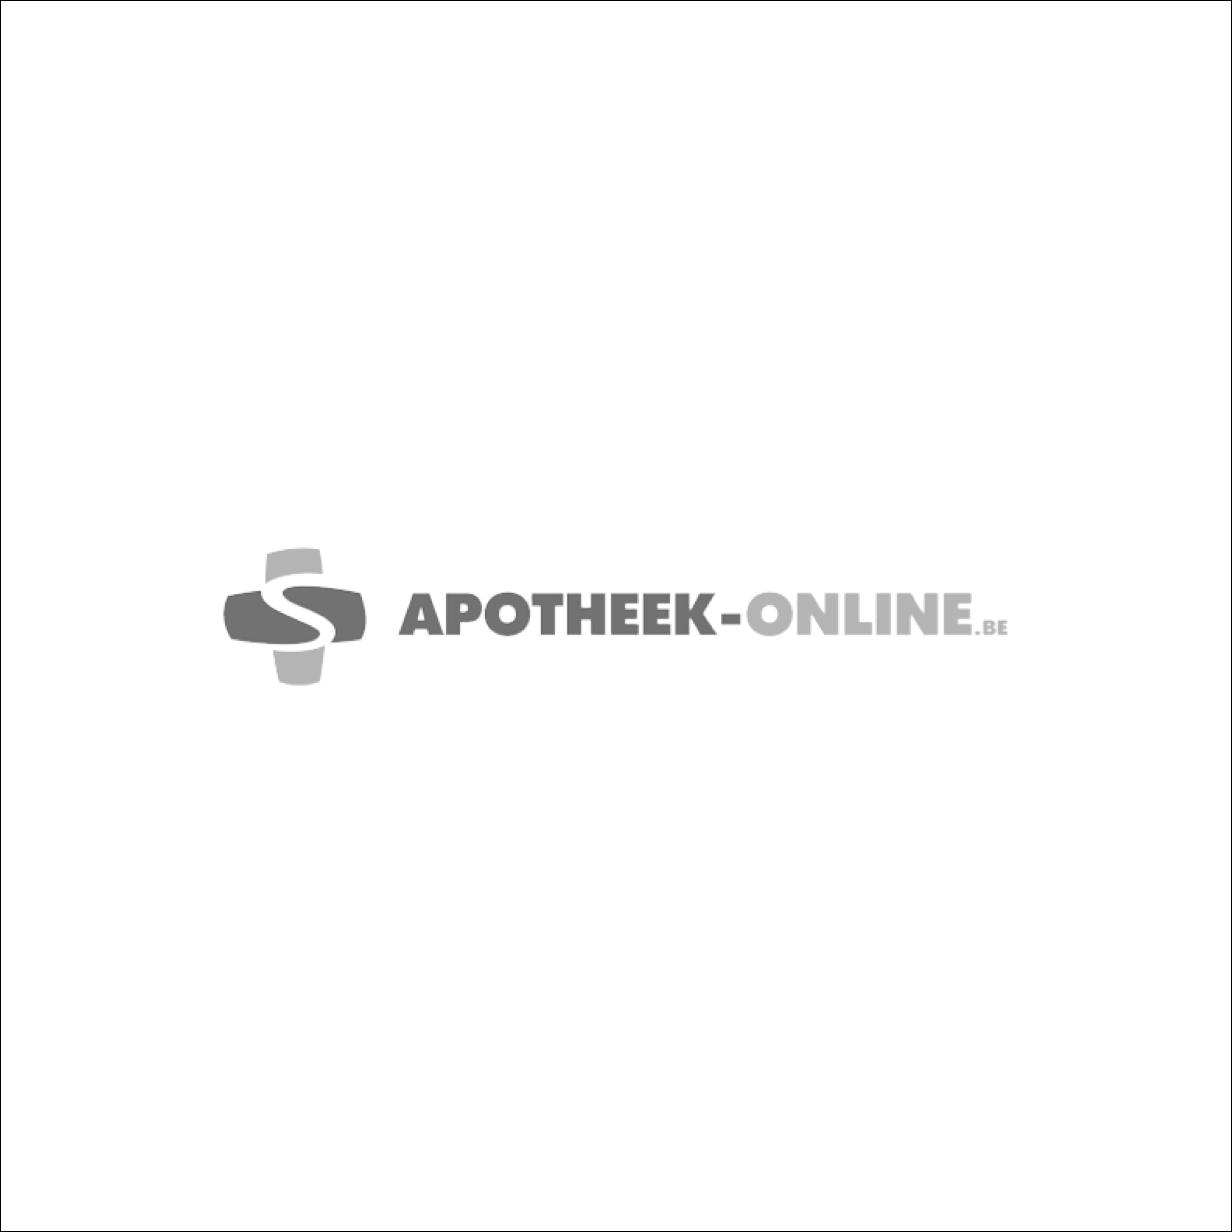 COBAN 2 3M BANDE COMPRESSION 5,0CMX2,70M 1 20022